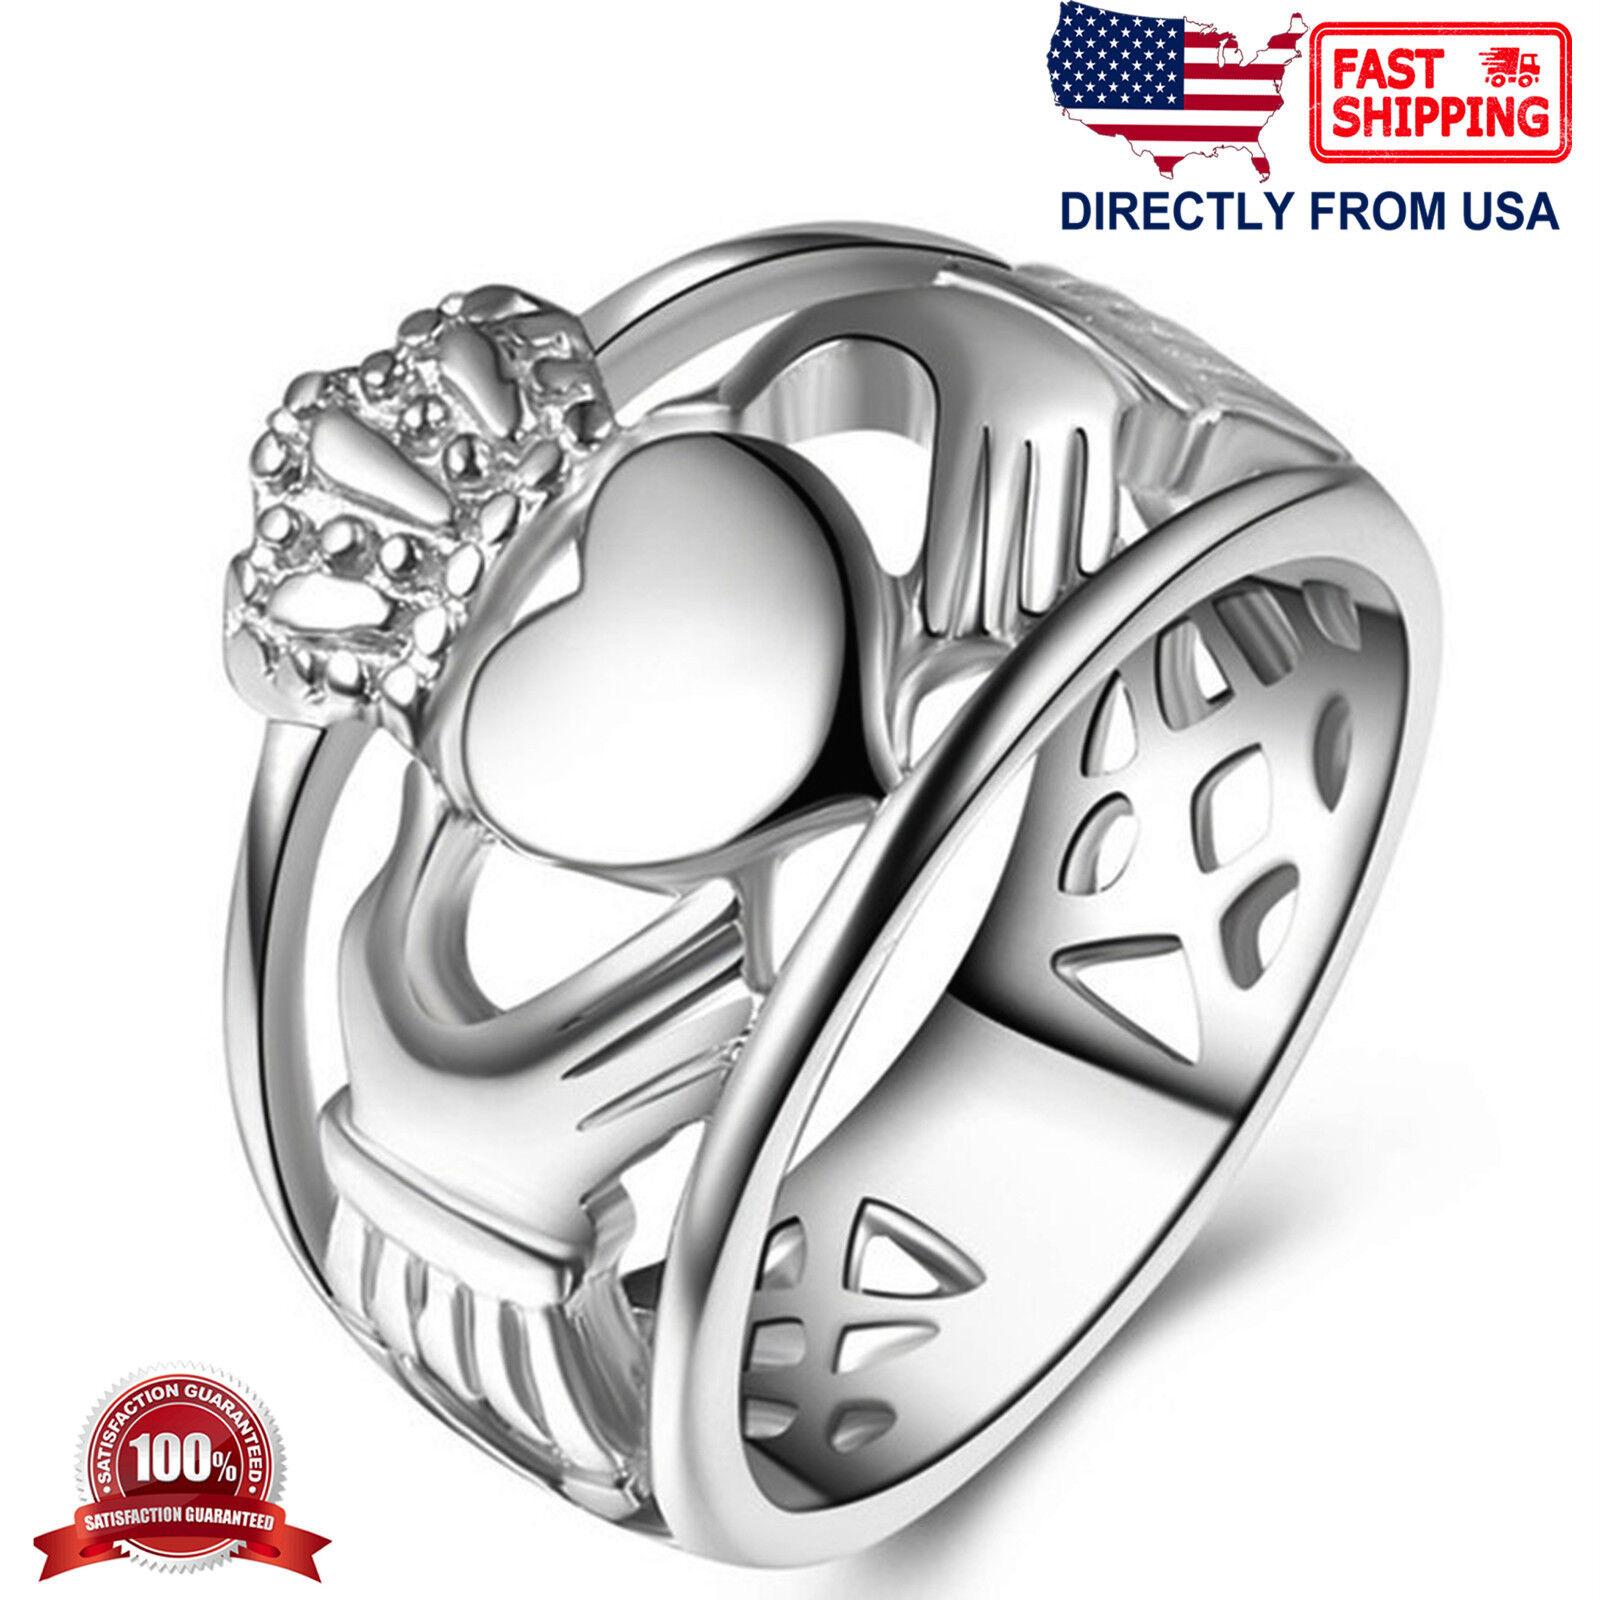 Unisex Stainless Steel Irish Friendship Heart Love Claddagh Ring Fashion Jewelry